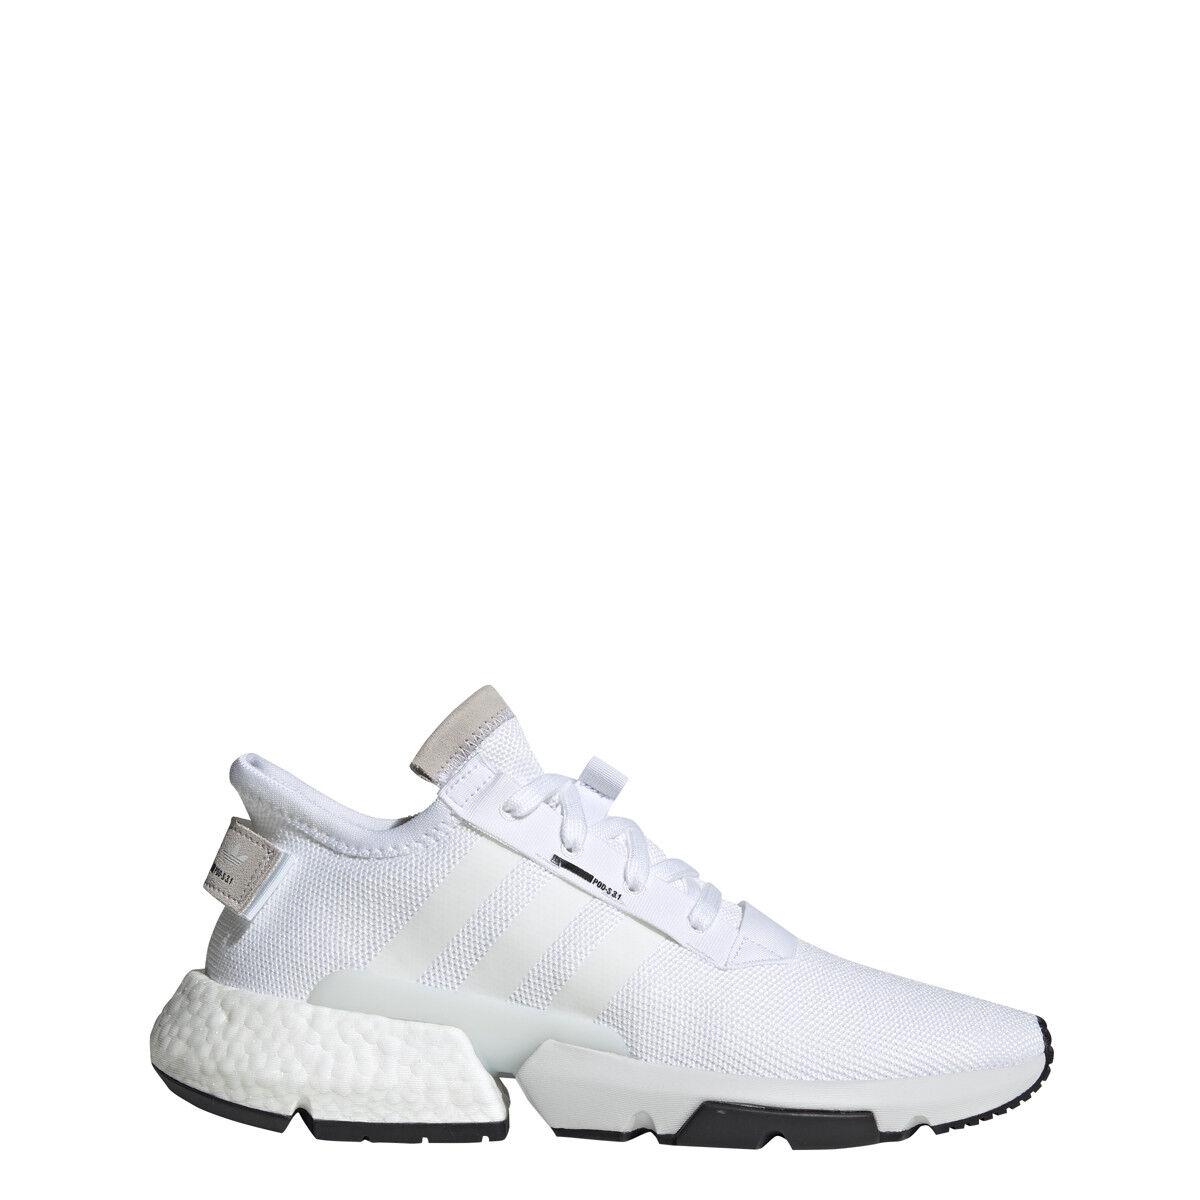 Adidas mens pod-s3.1 - Weiß / weiß / schwarz - pod-s3.1 b37367 9d17b9